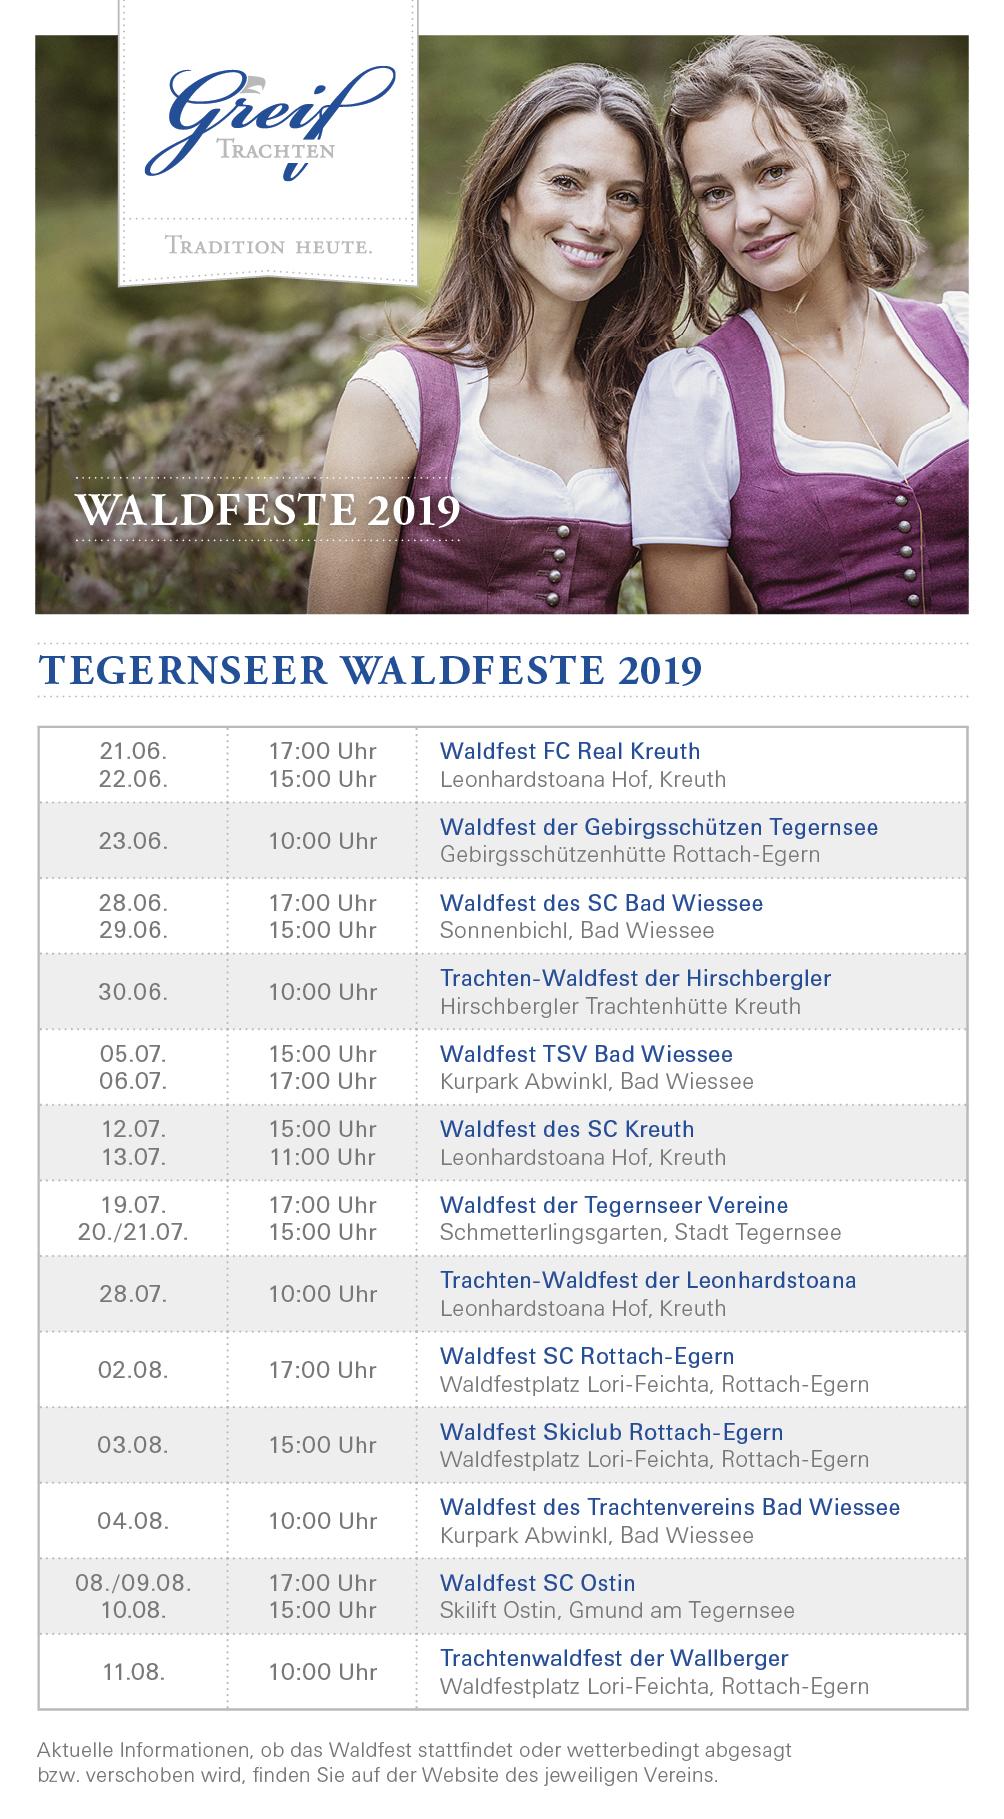 Trachten_Greif_Waldfestkalender_FB_2019.jpg